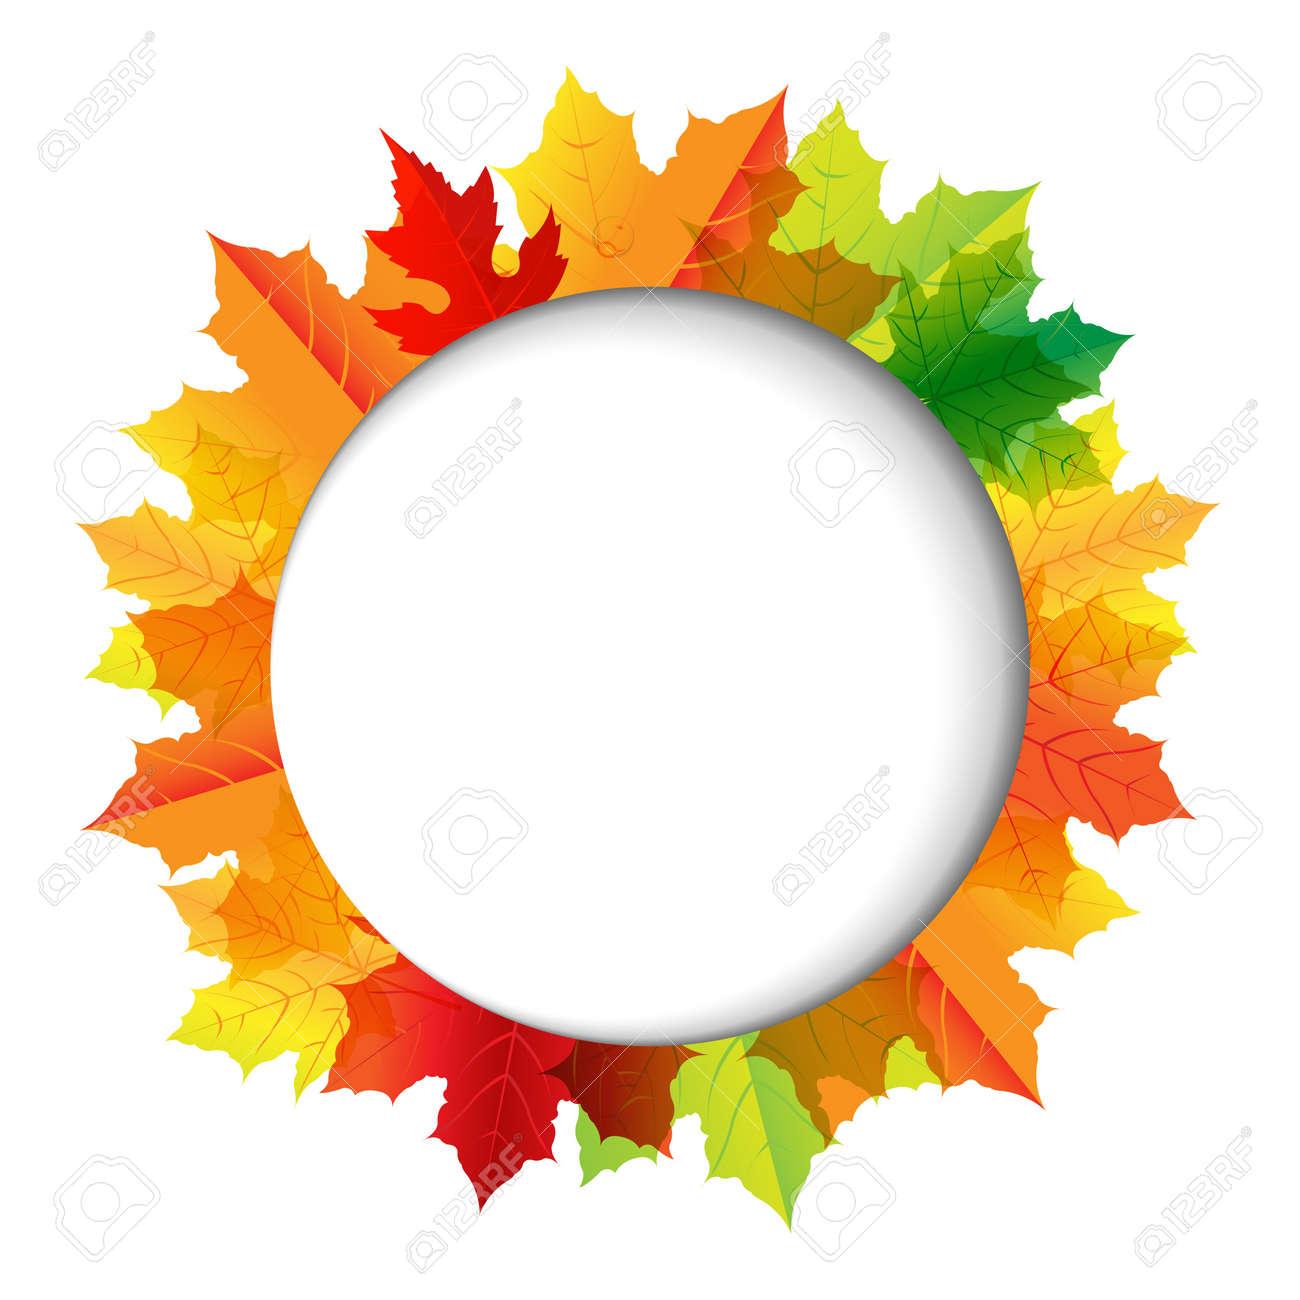 Autumn Composition With Speech Bubble Illustration Stock Vector - 15069802